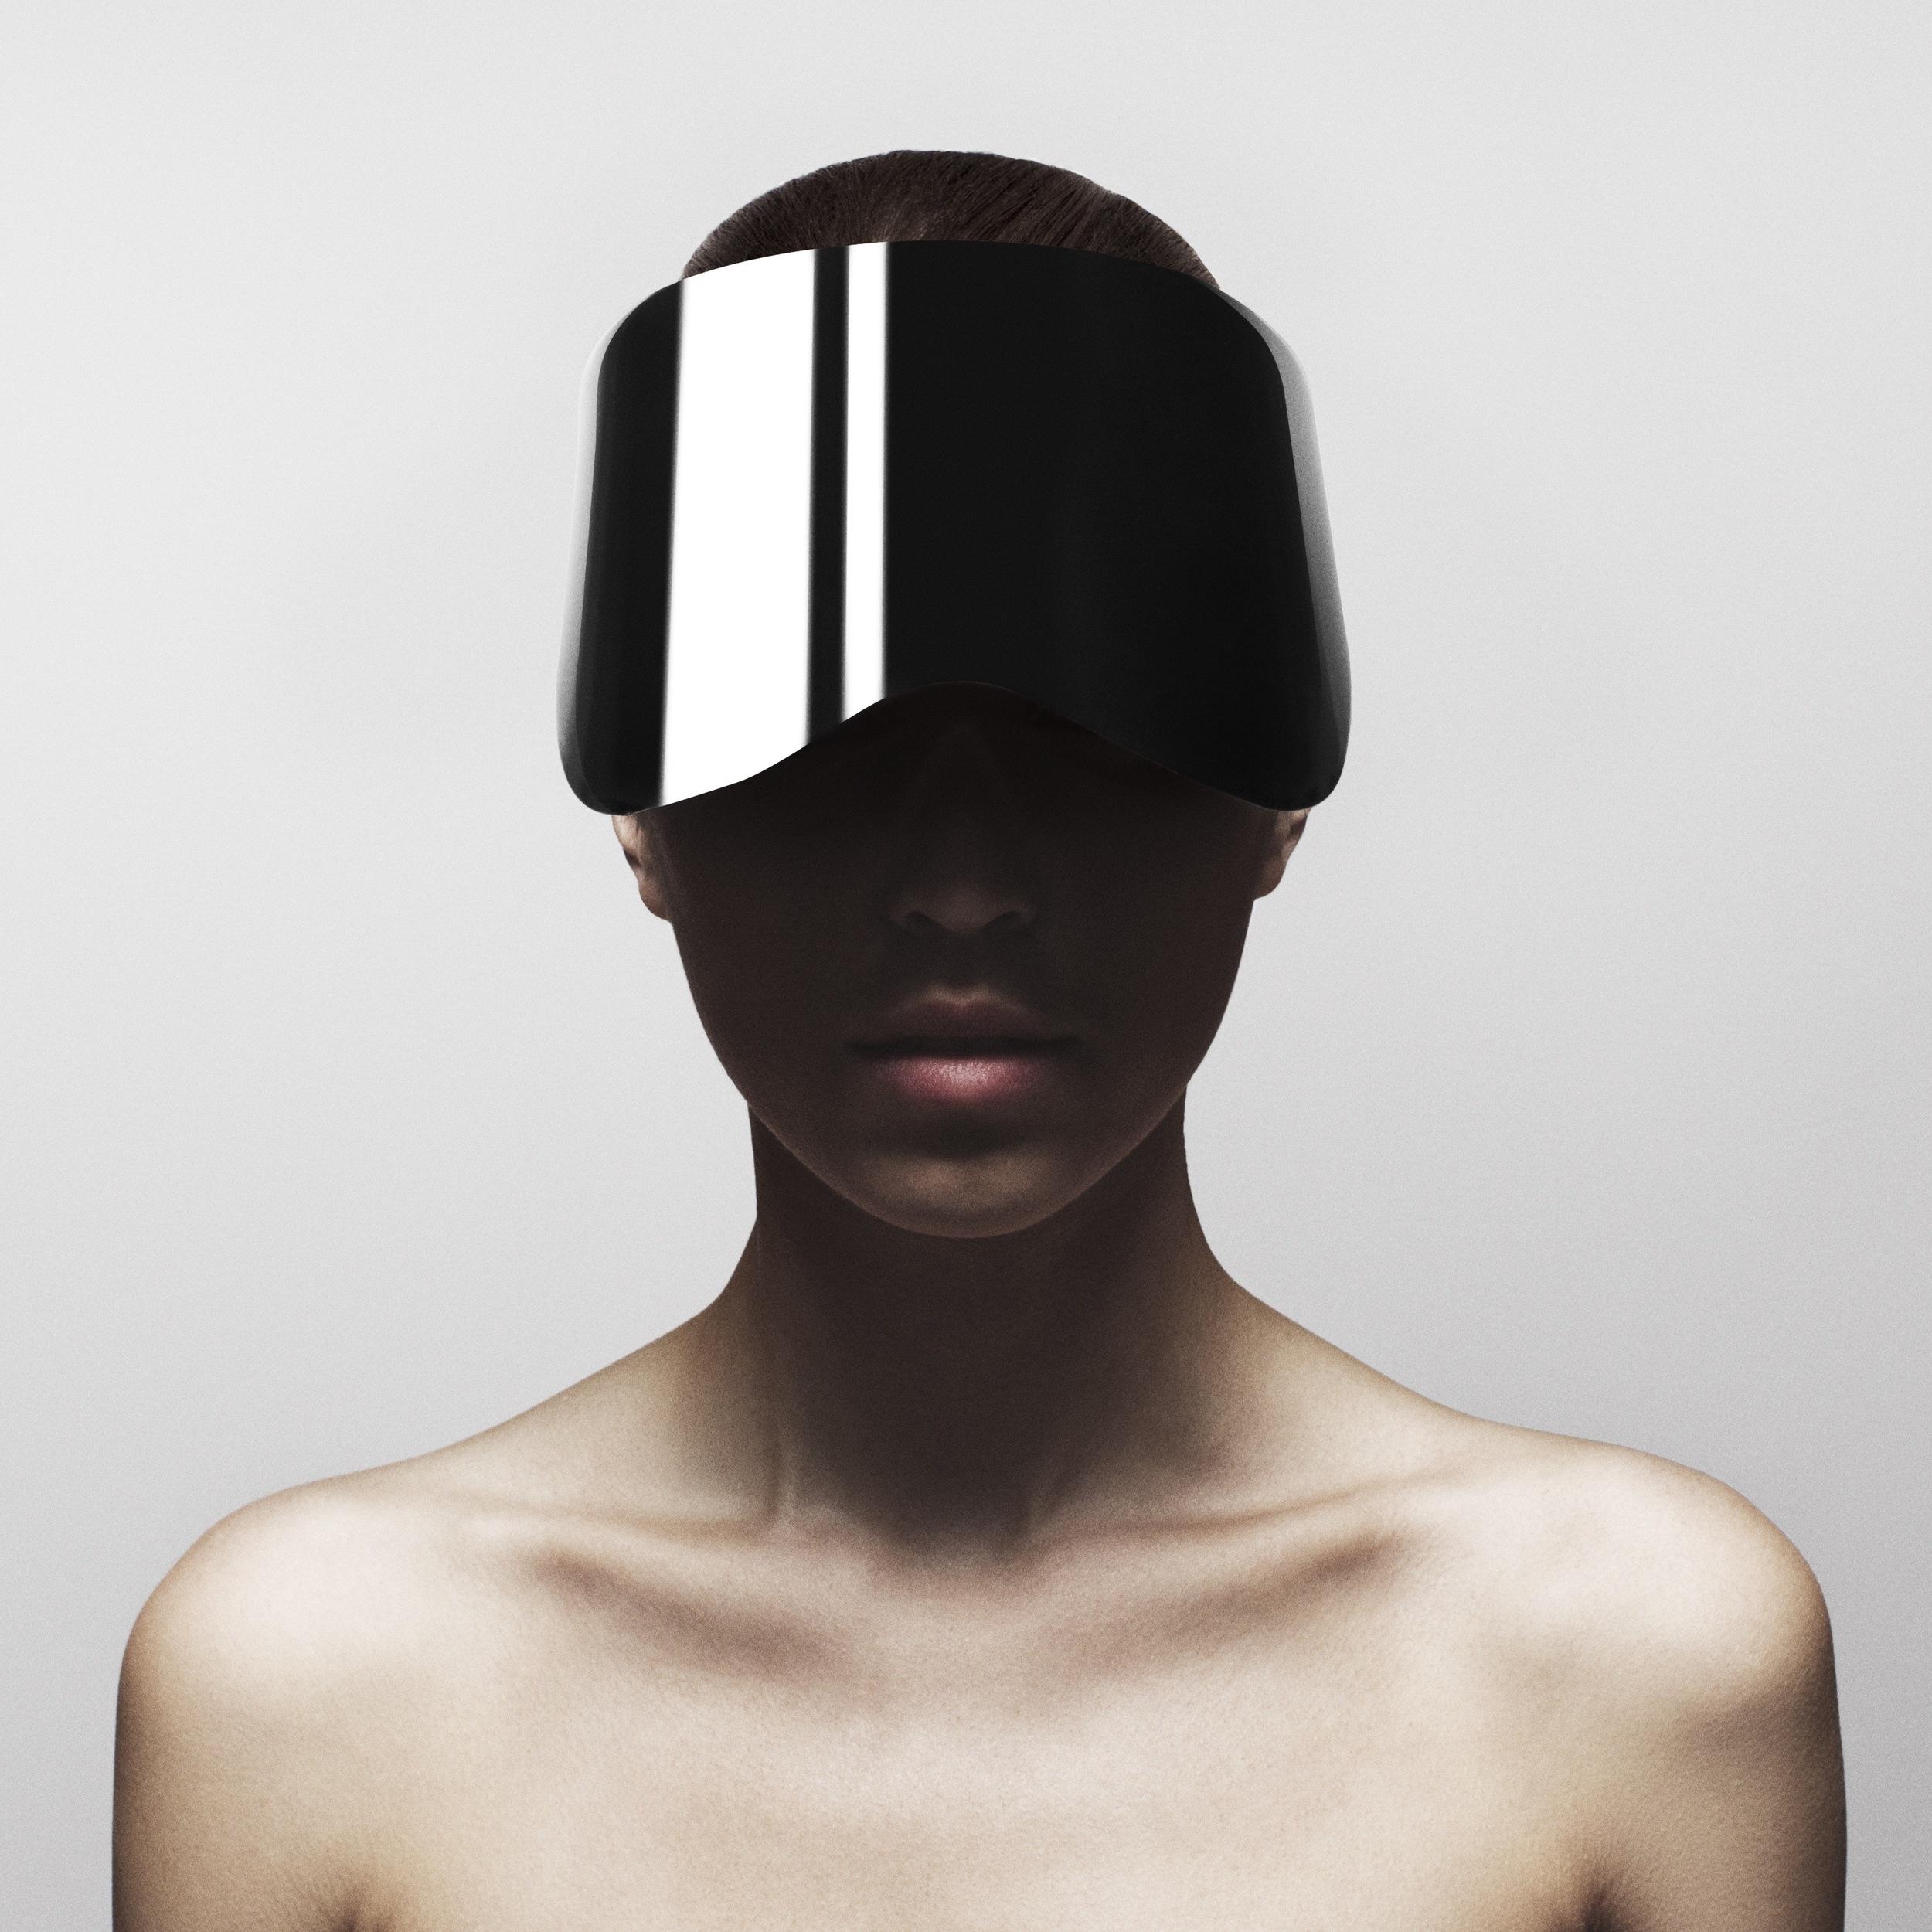 Kateboy - 'ONE' Album